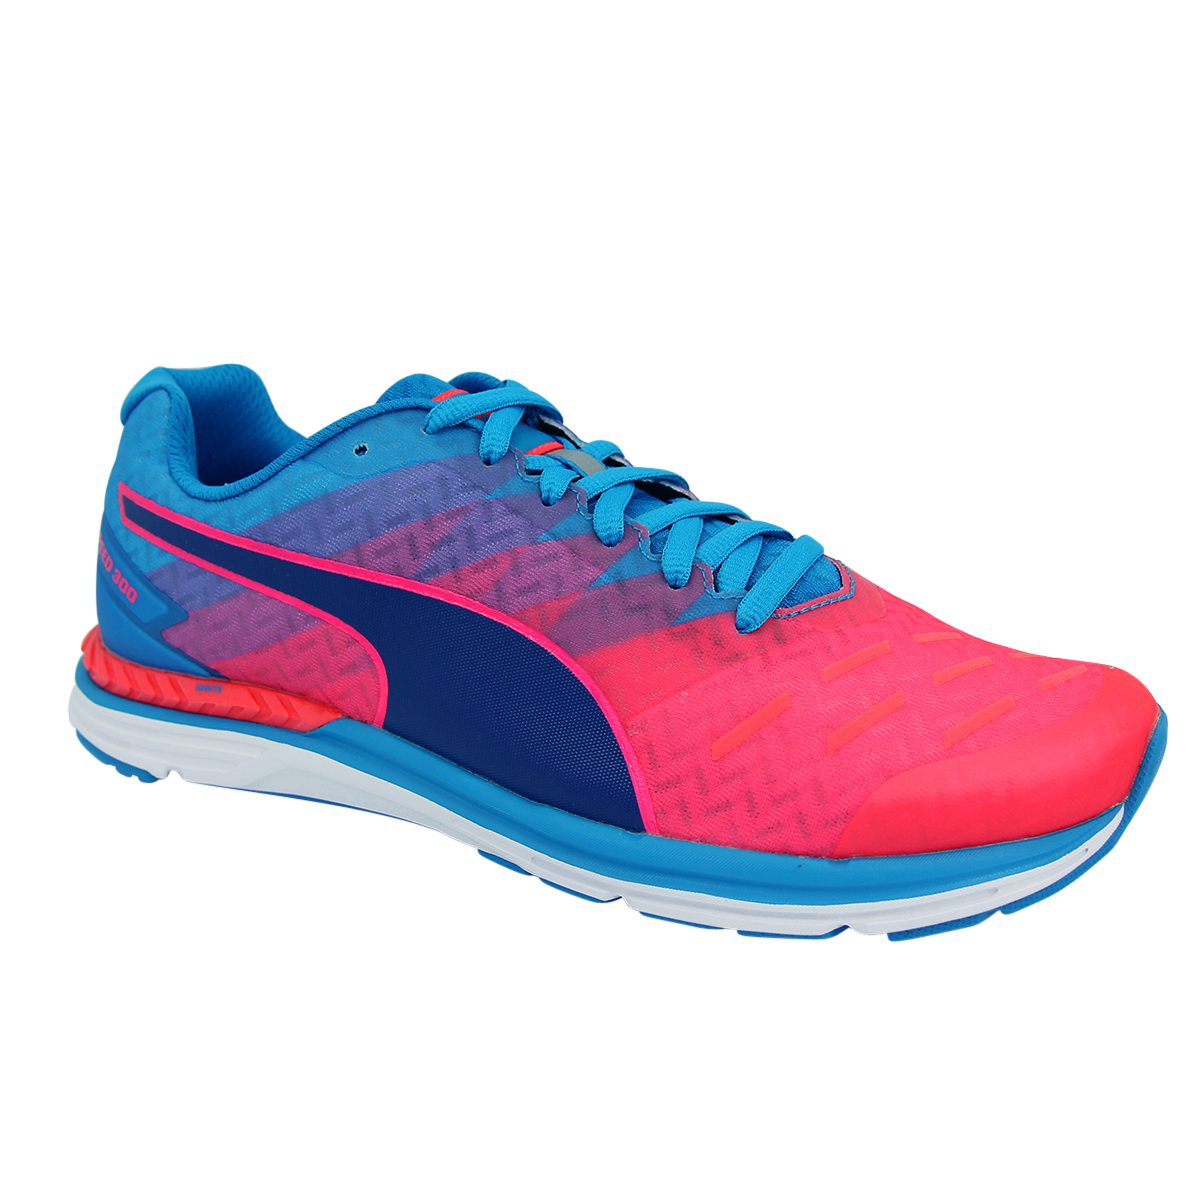 300 Ignite Speed Sneakers Puma Details Herren Zu Schuhe Neu 2D9EHIYW